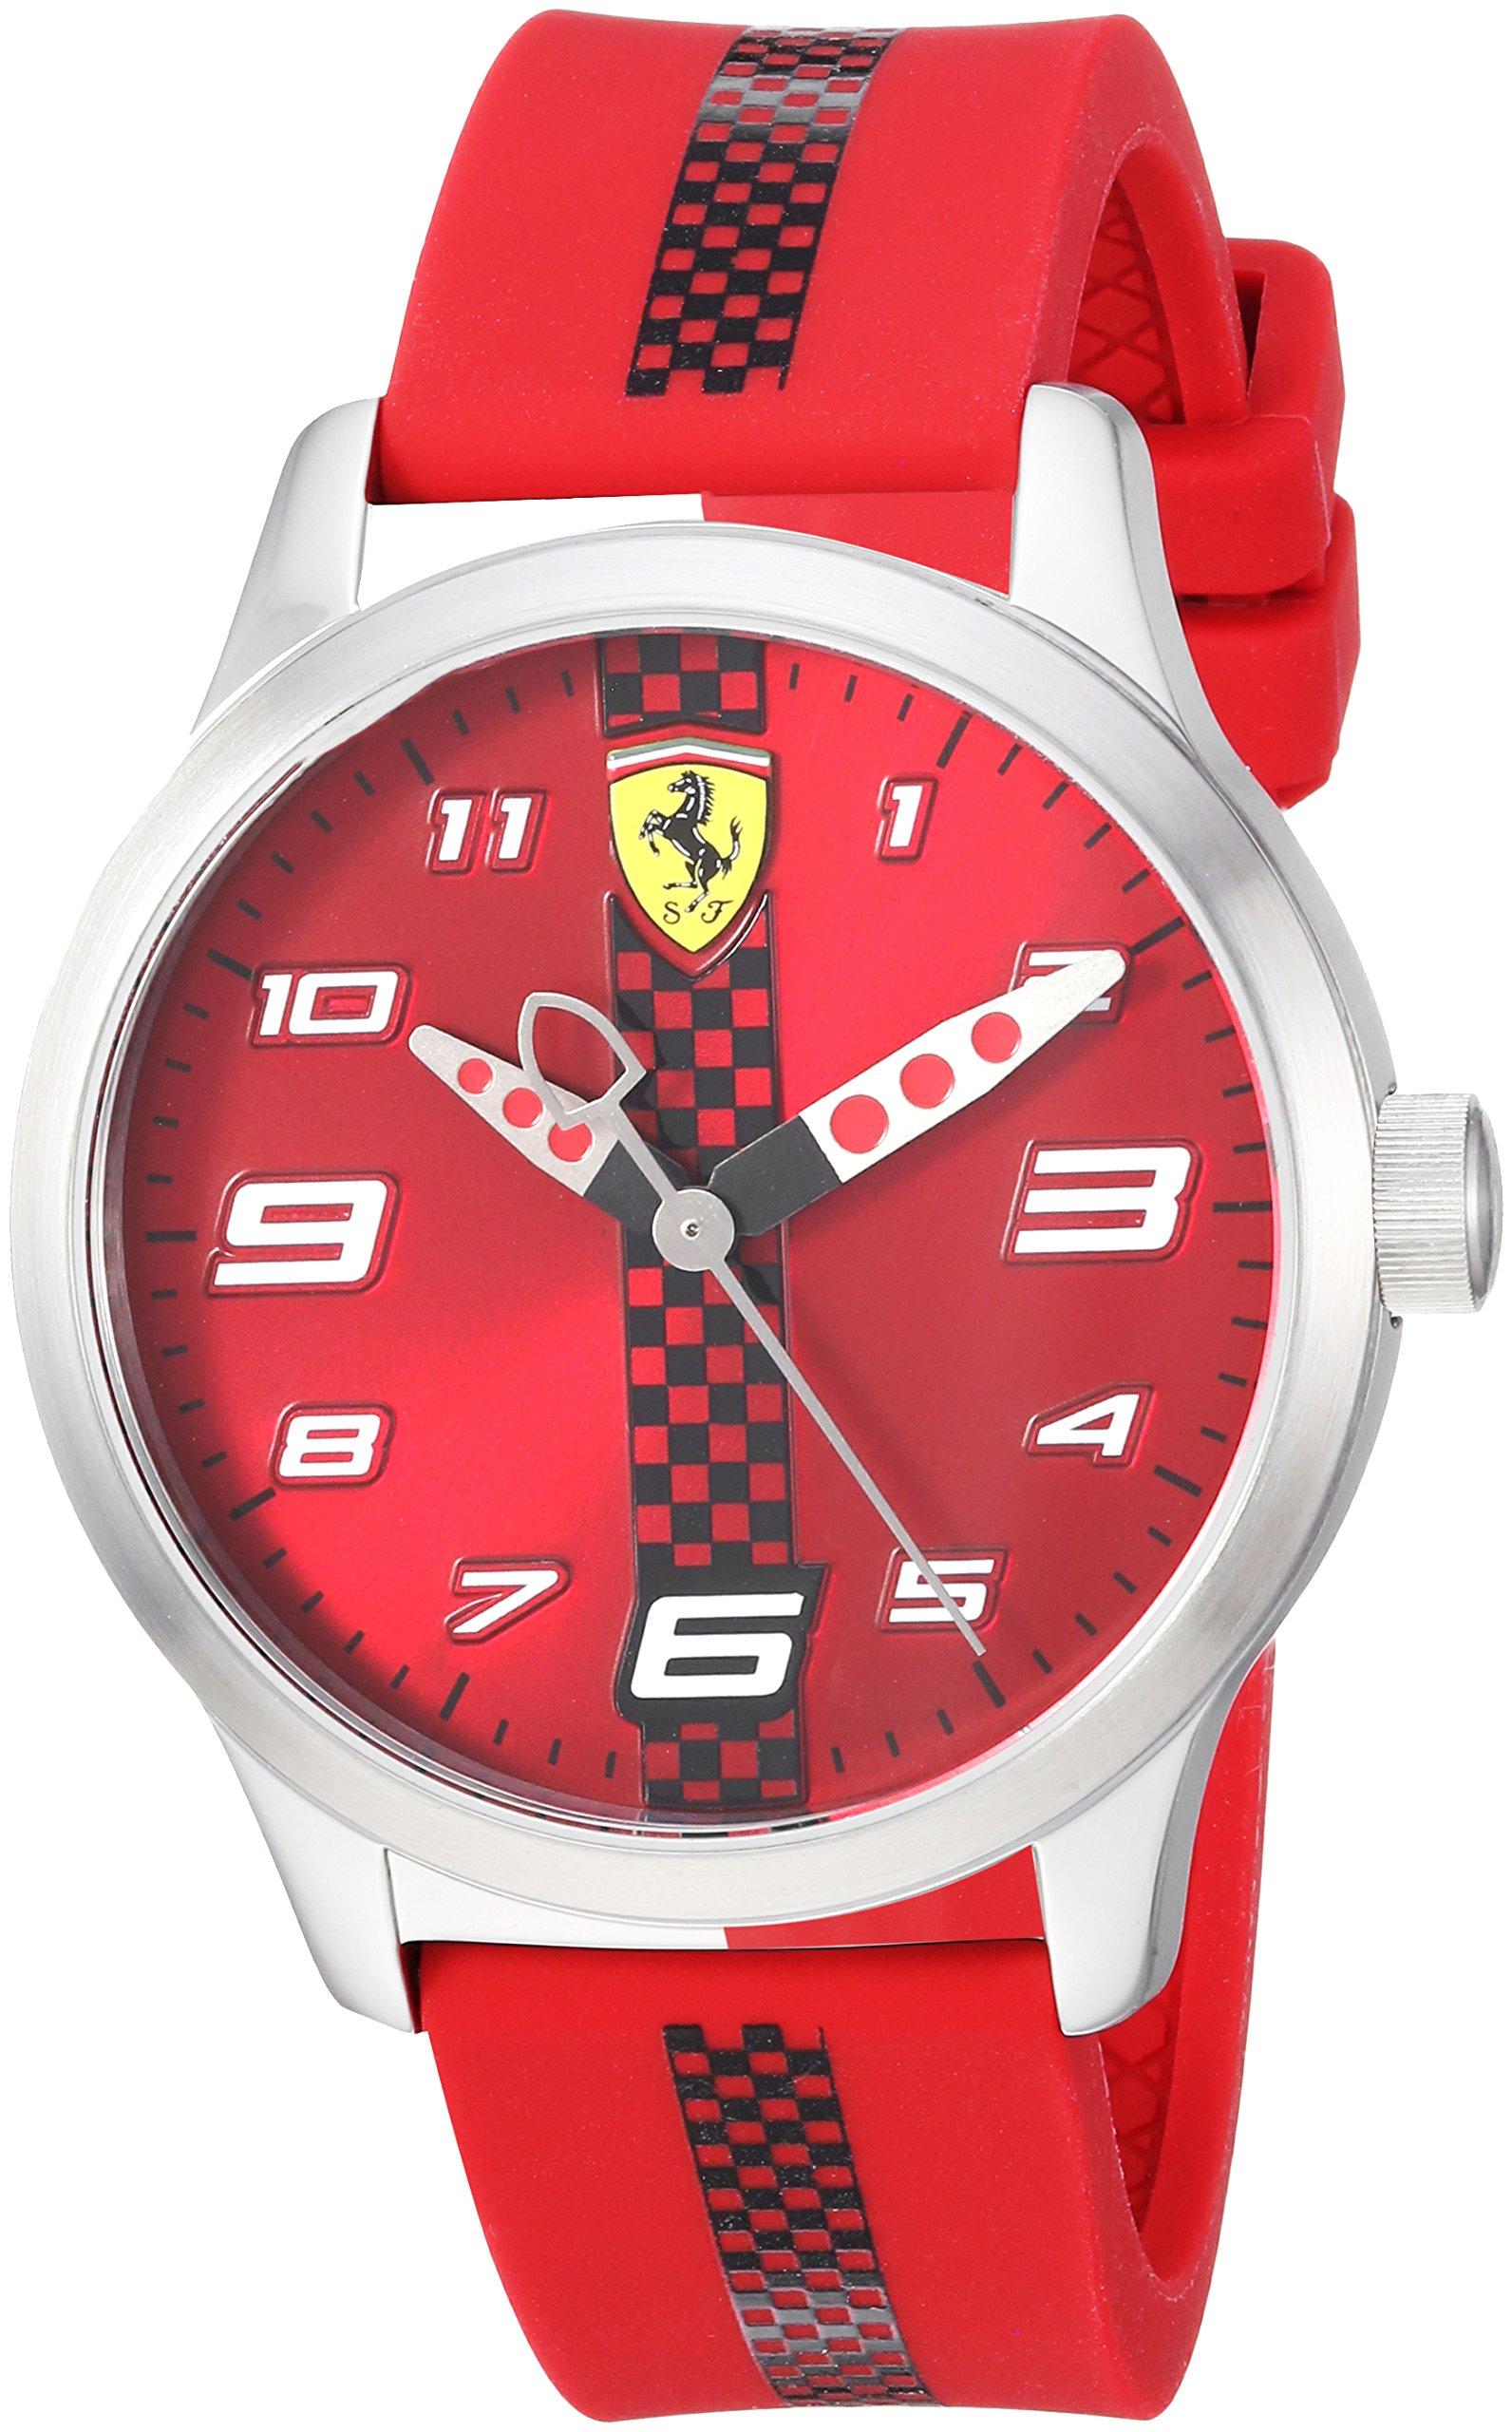 Ferrari Pitlane, Quartz Stainless Steel and Silicone Strap Casual Watch, Black, Boy, 860001 by Ferrari